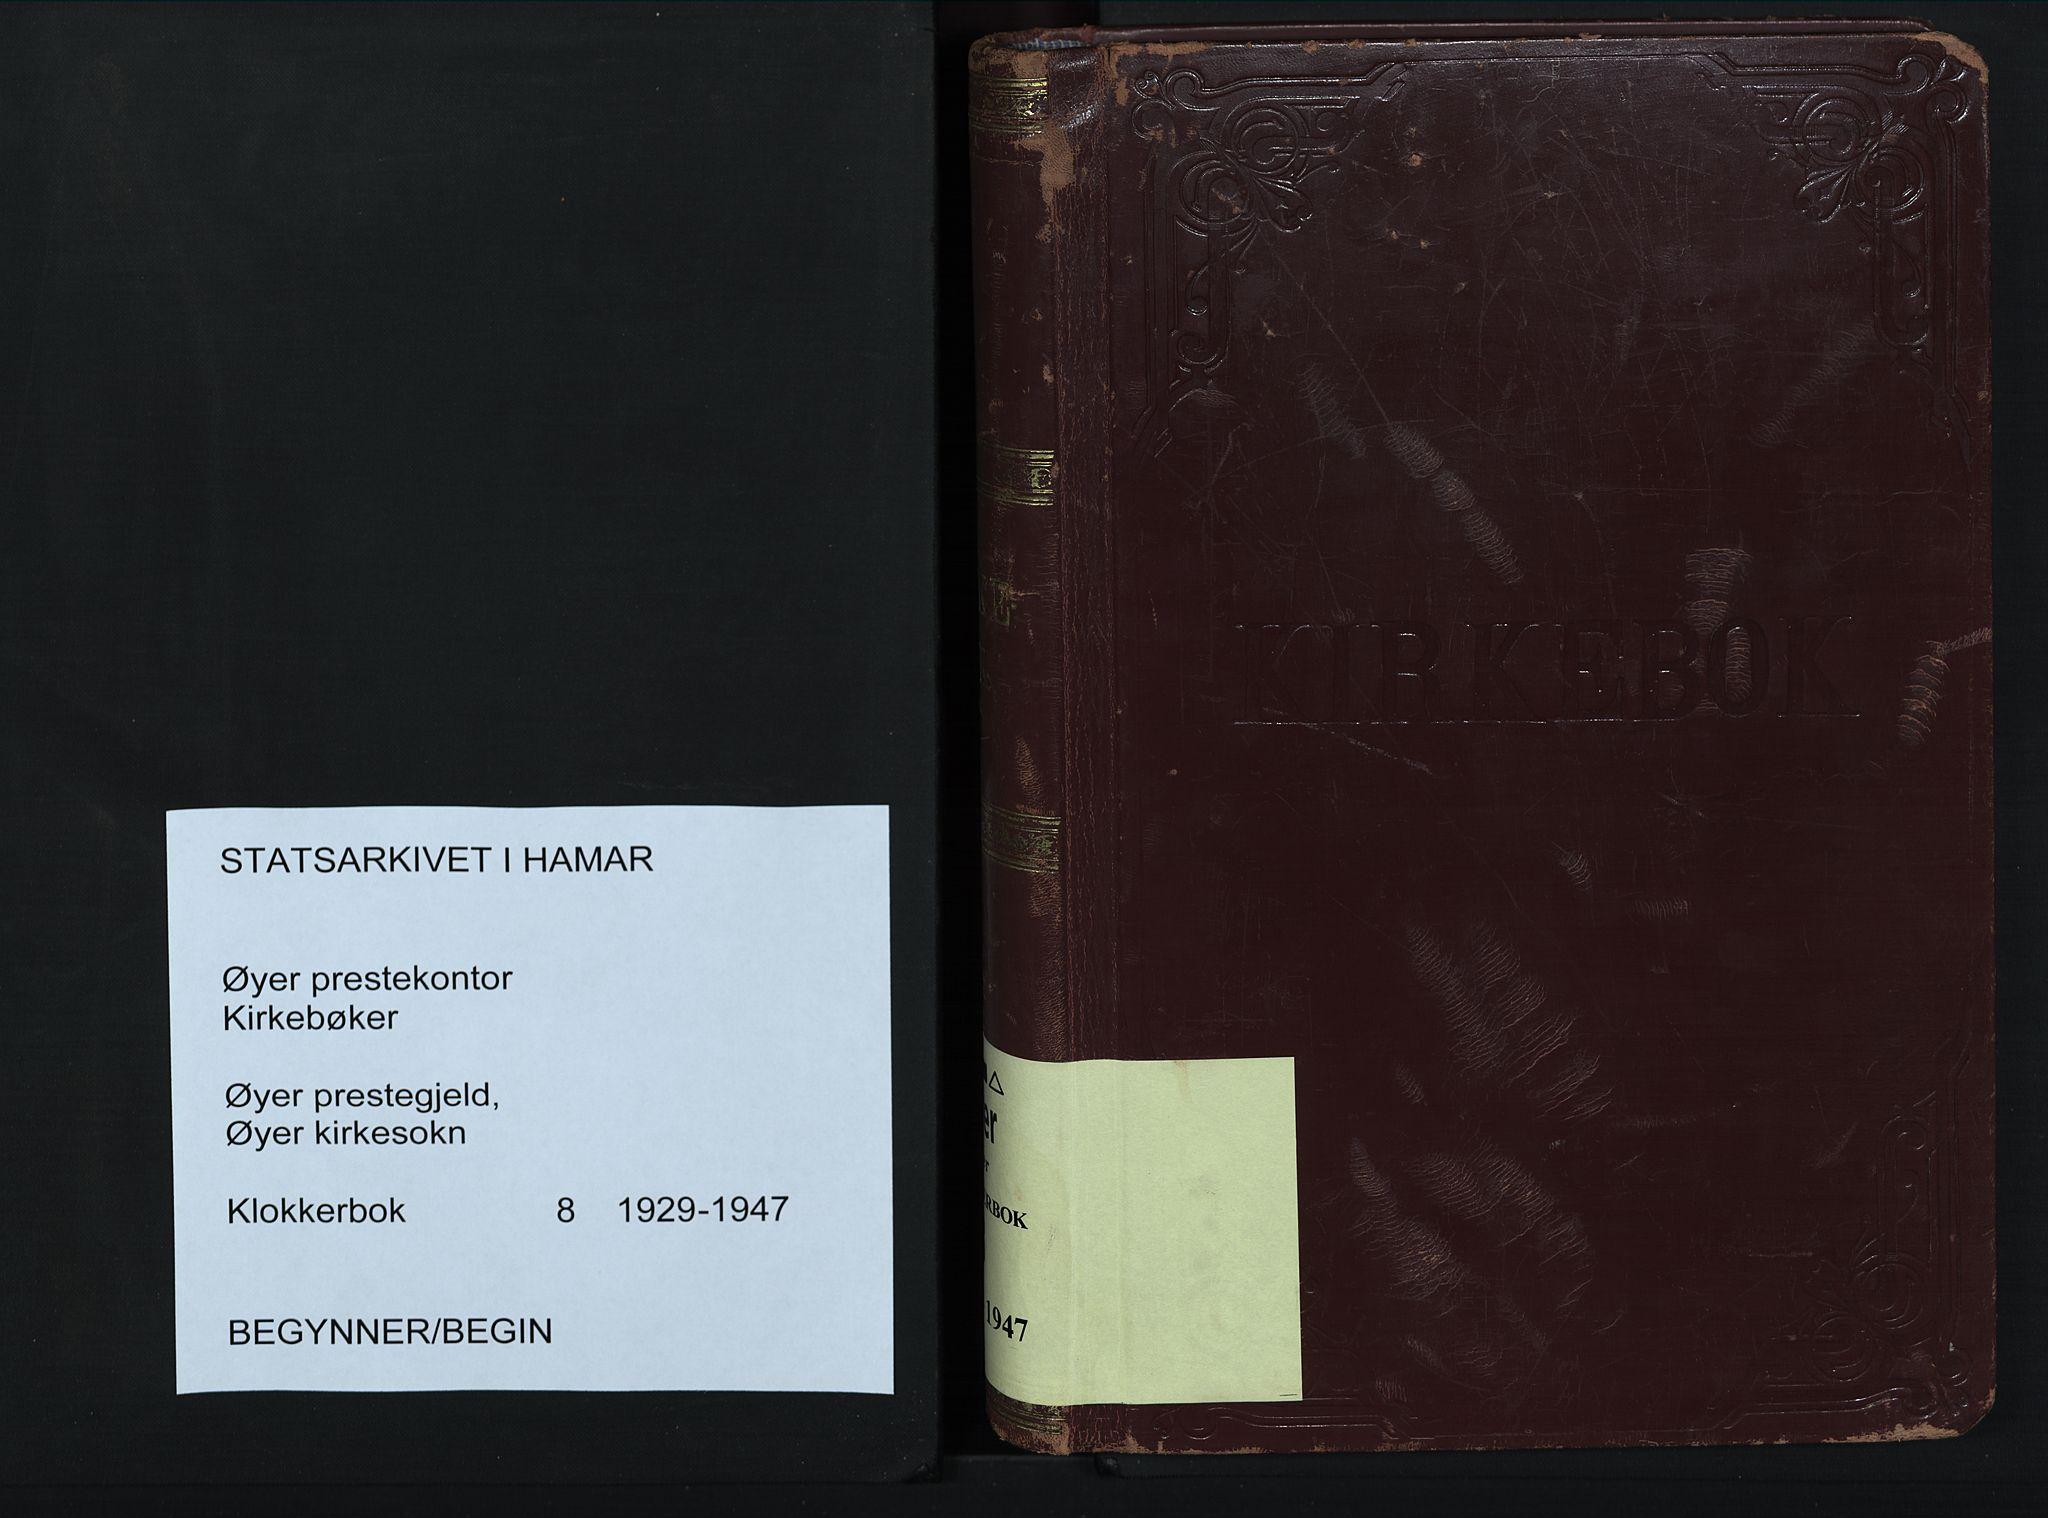 SAH, Øyer prestekontor, Klokkerbok nr. 8, 1929-1947